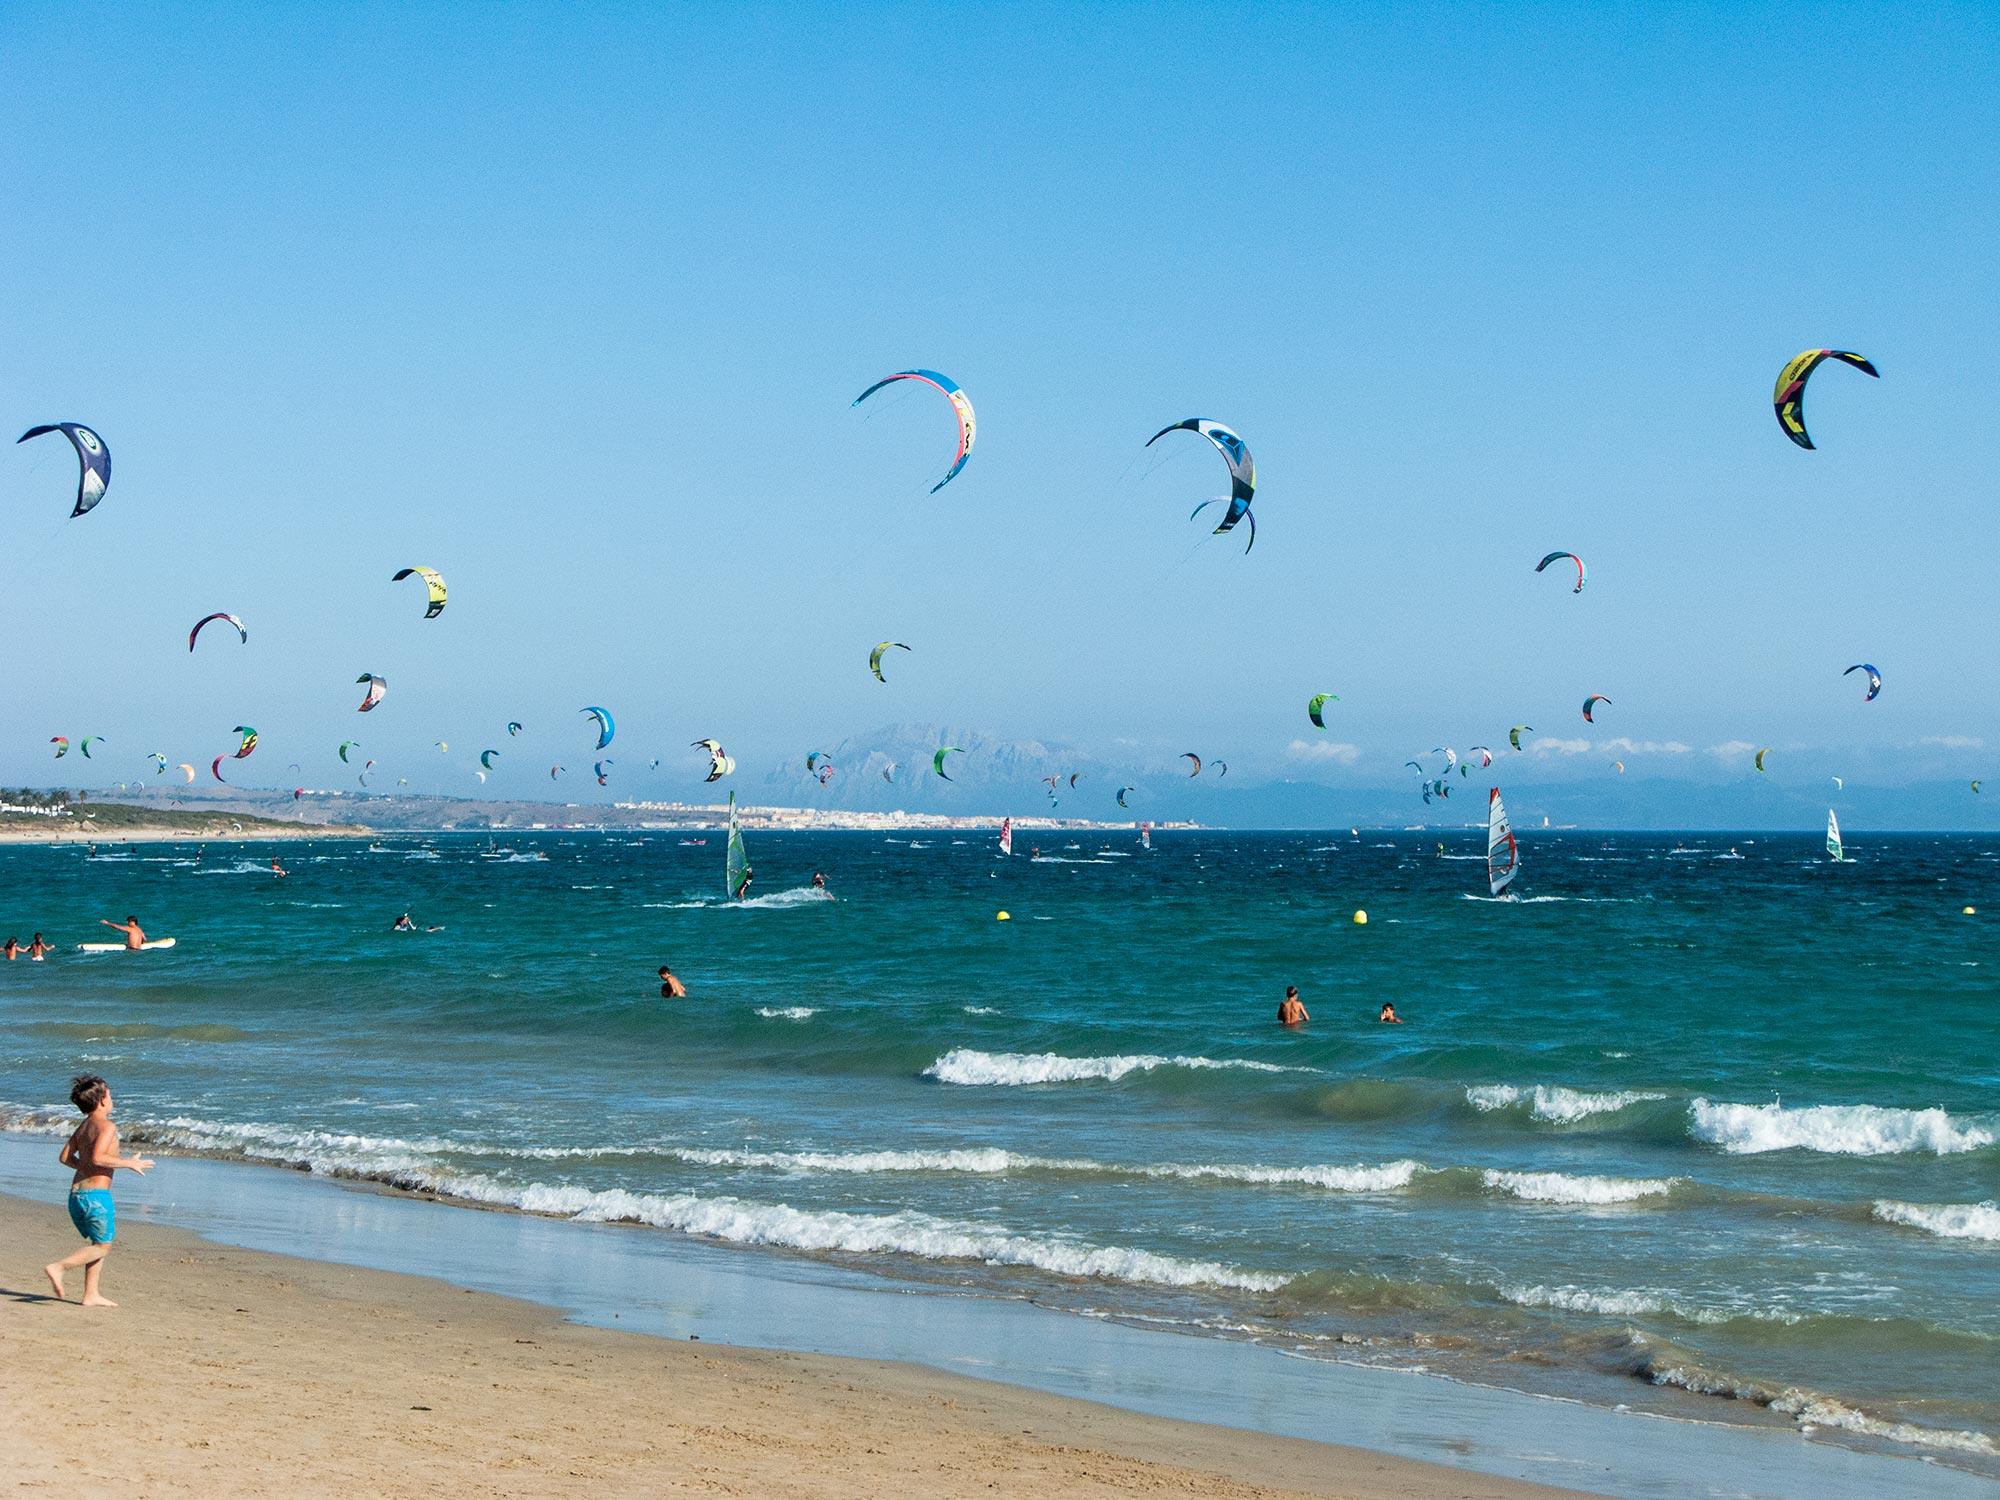 valdevaqueros beach kitesurfers and africa in the horizon